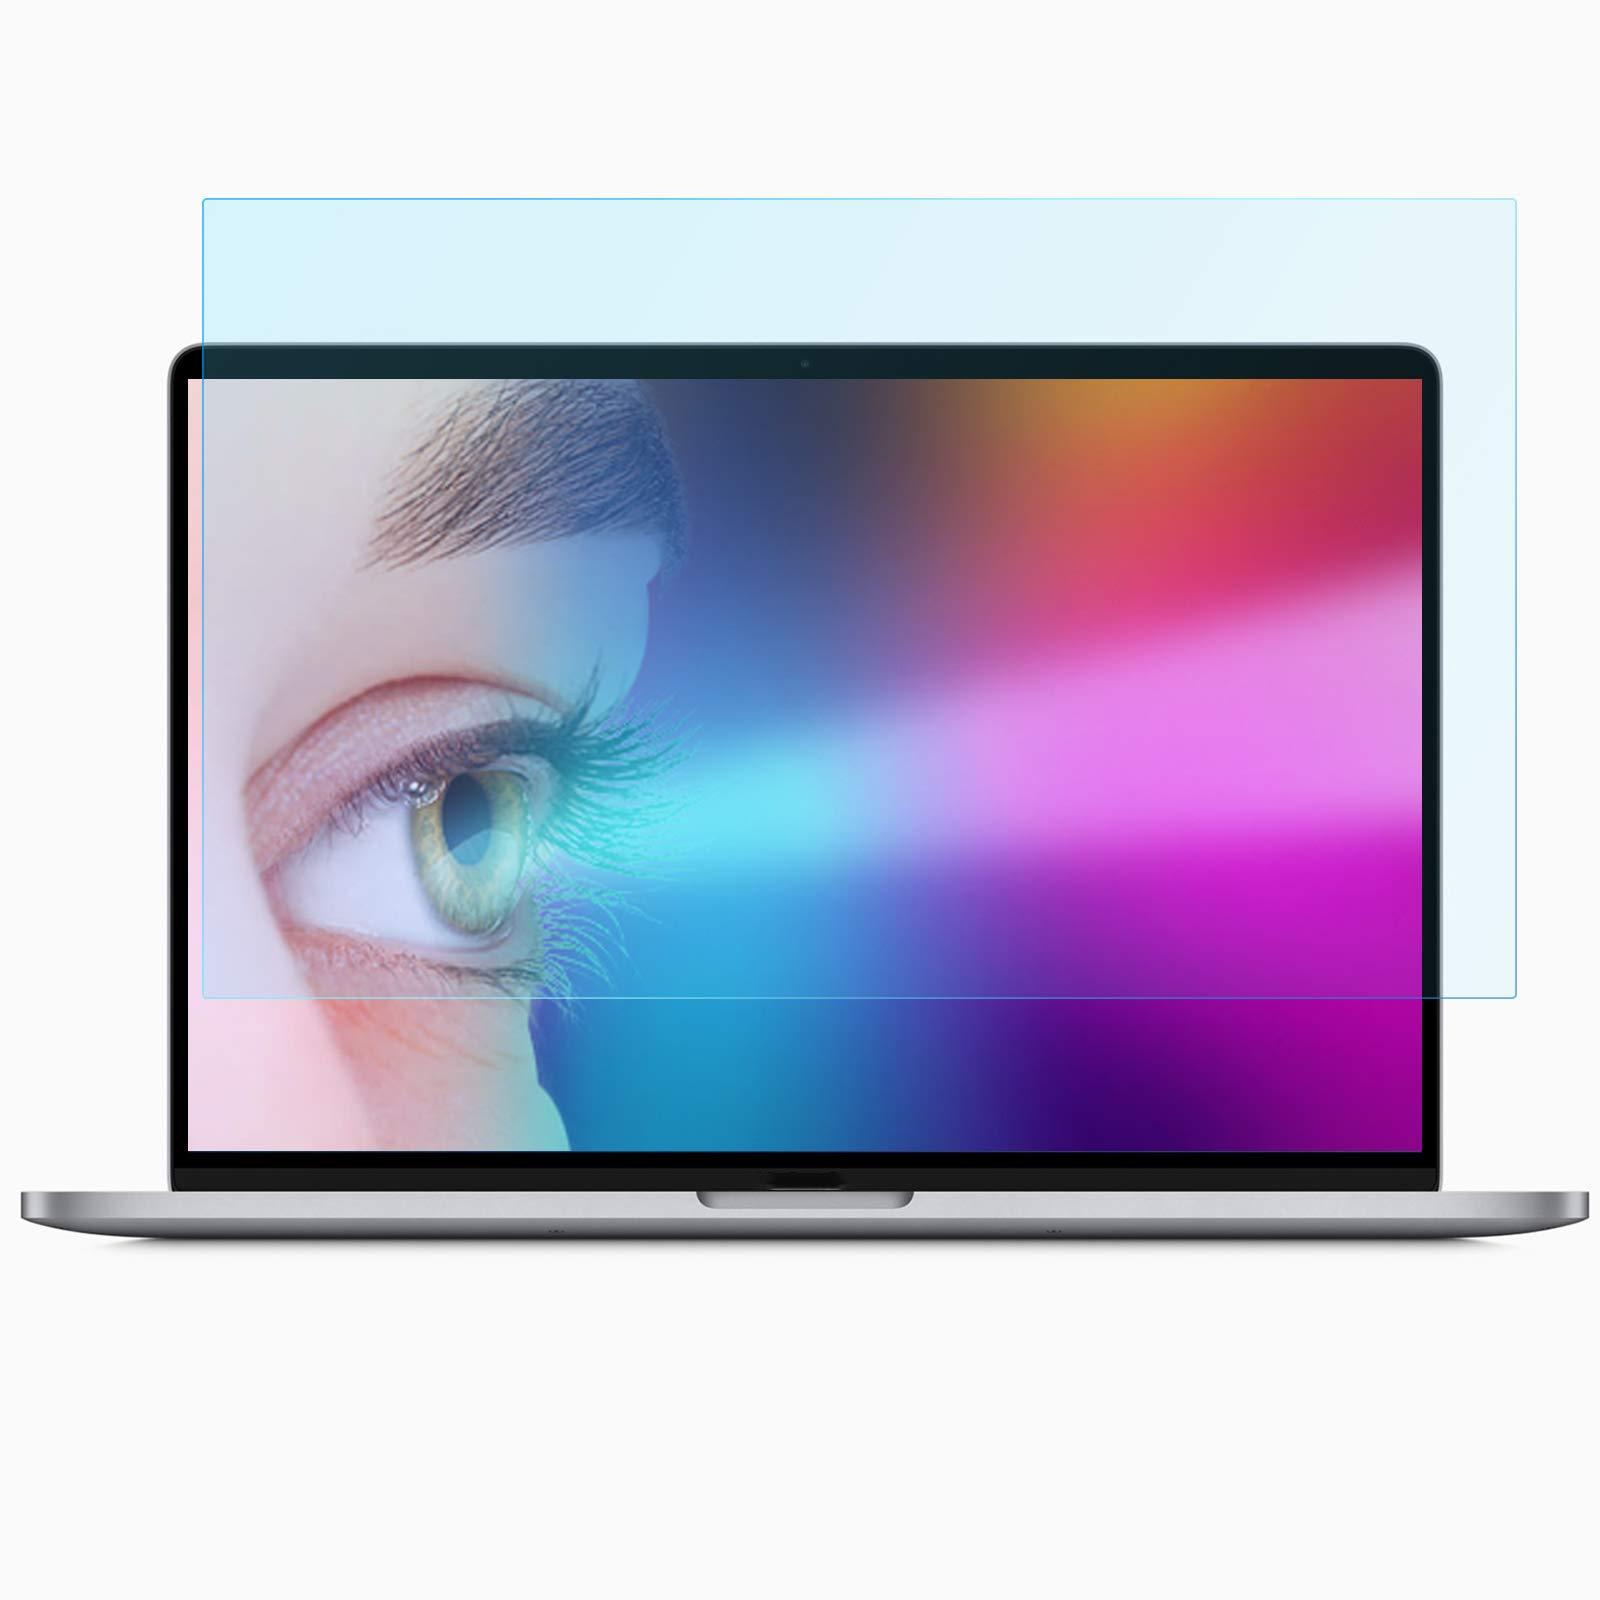 "12.5 Inch Blue Light Screen Protector Laptop Anti Glare Filter Eye Protection Blue Light Blocking Screen Protector for 12.5"" with Display 16:9 Laptops (for 12.5 inch laptop)"